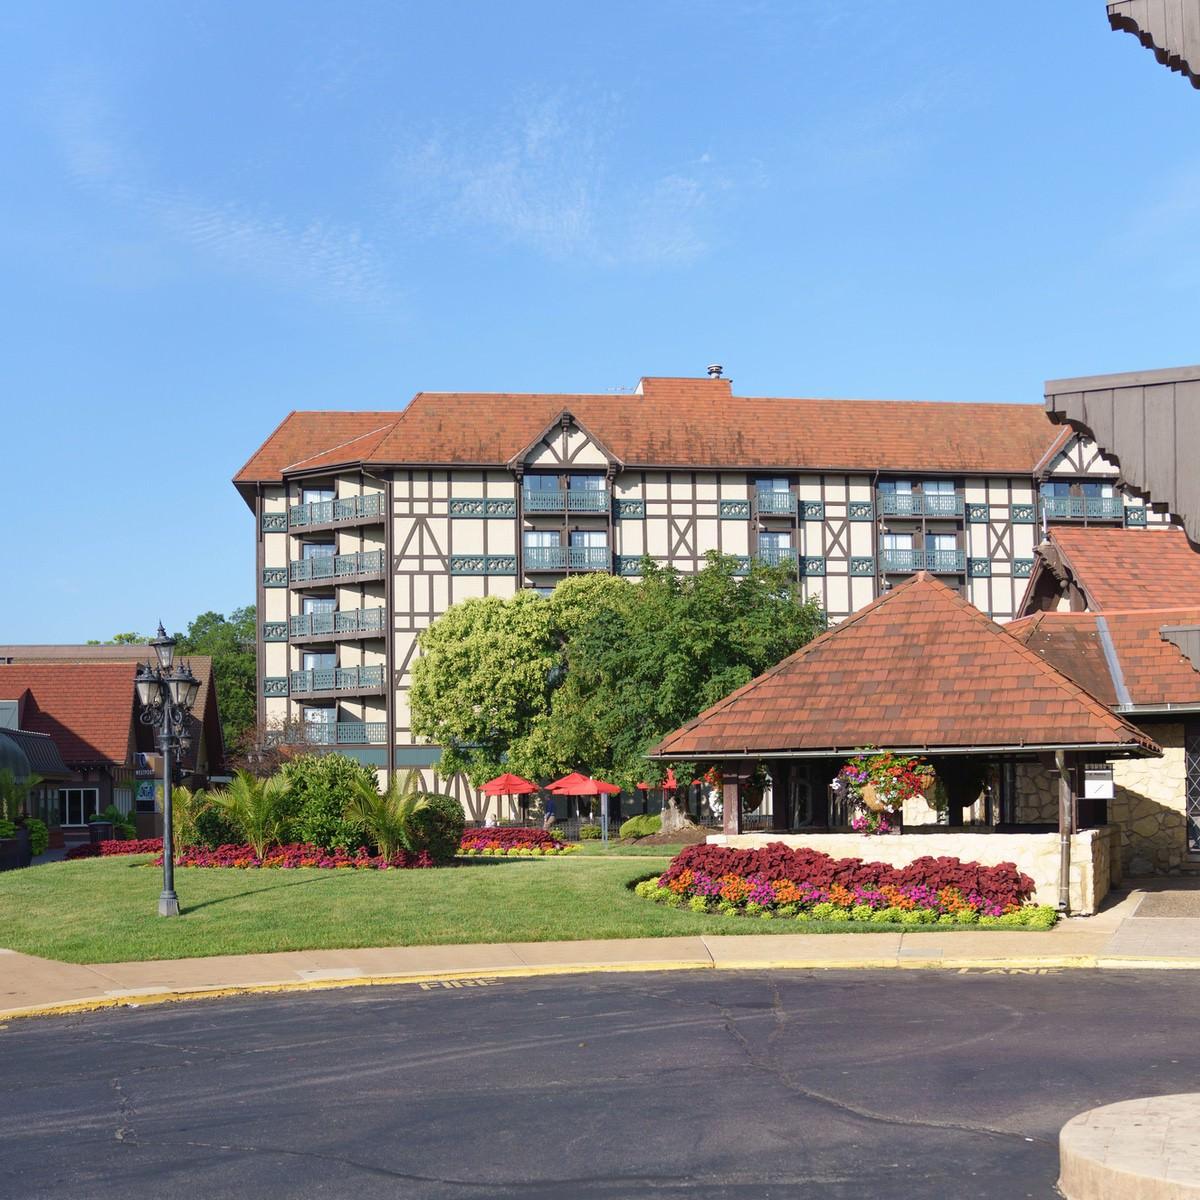 Sheraton Westport Chalet hotel